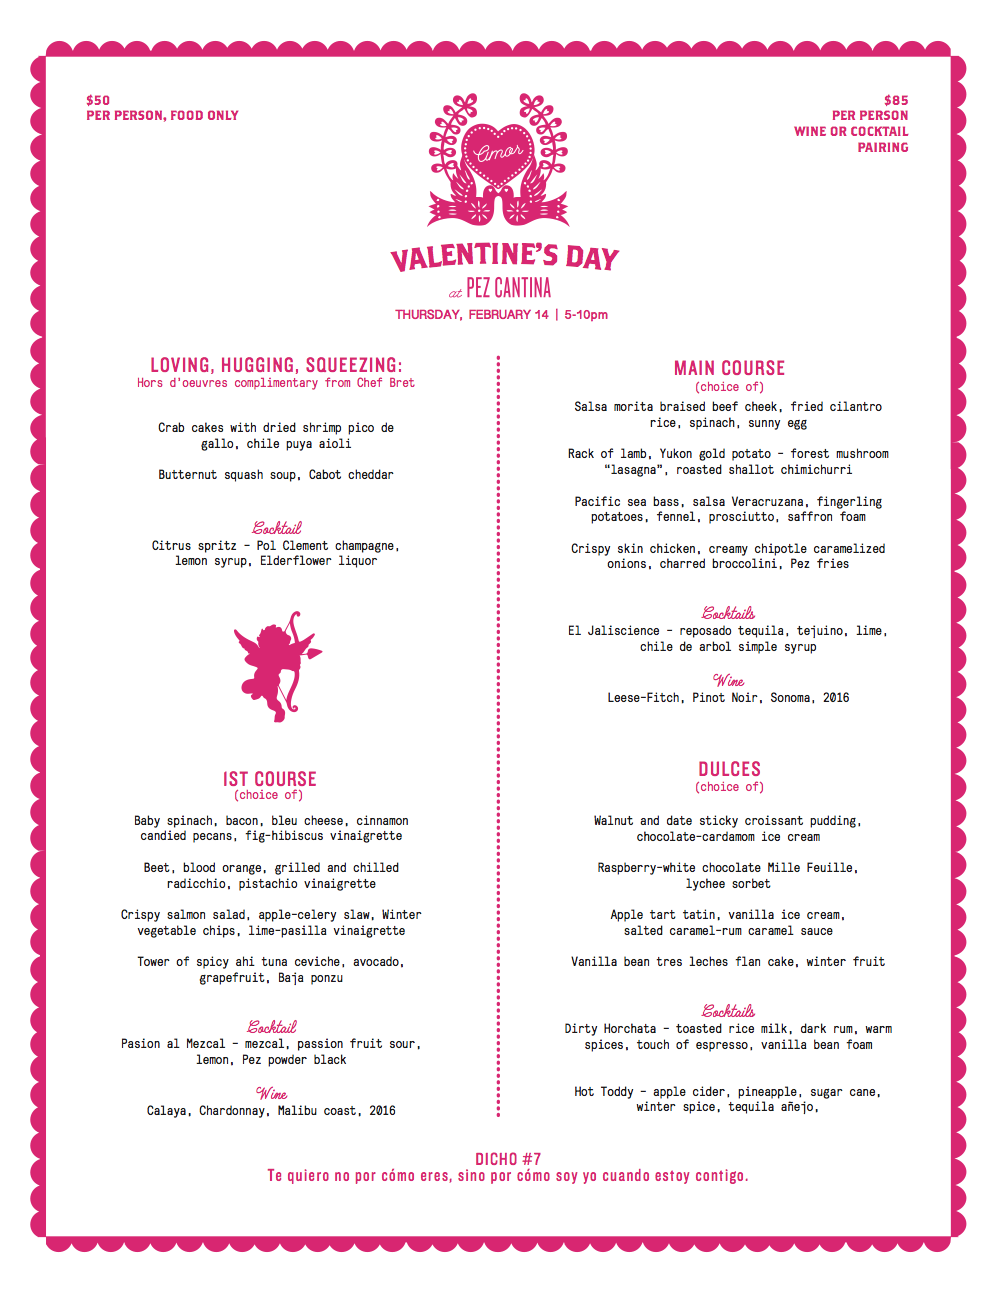 Pez_2019_VDAY_menu.png